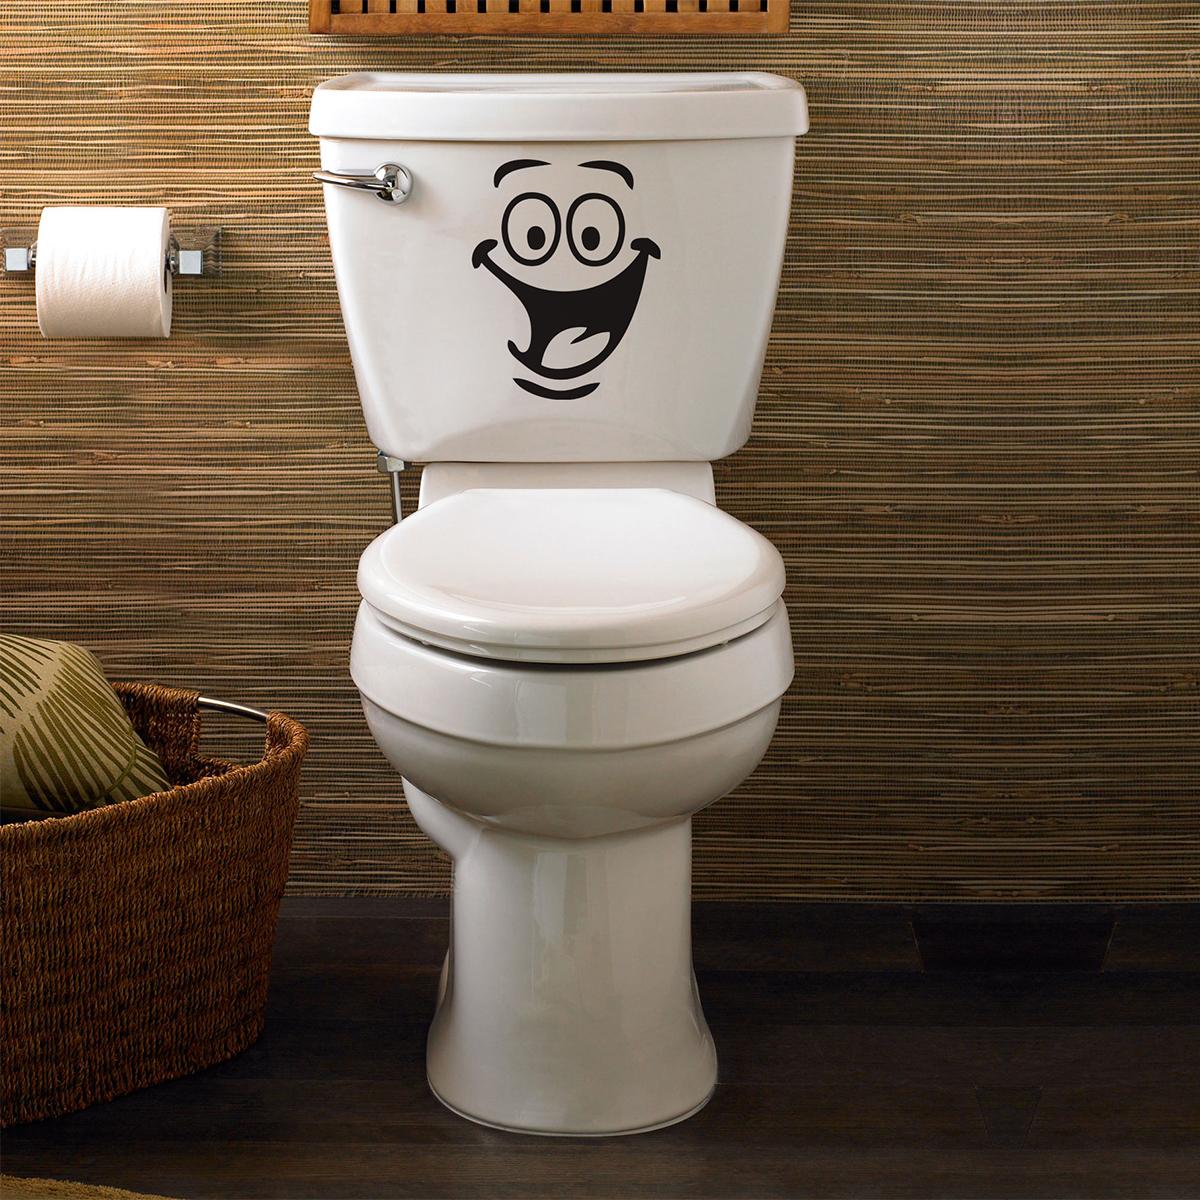 Tuvalet Klozet Kapağı Sticker